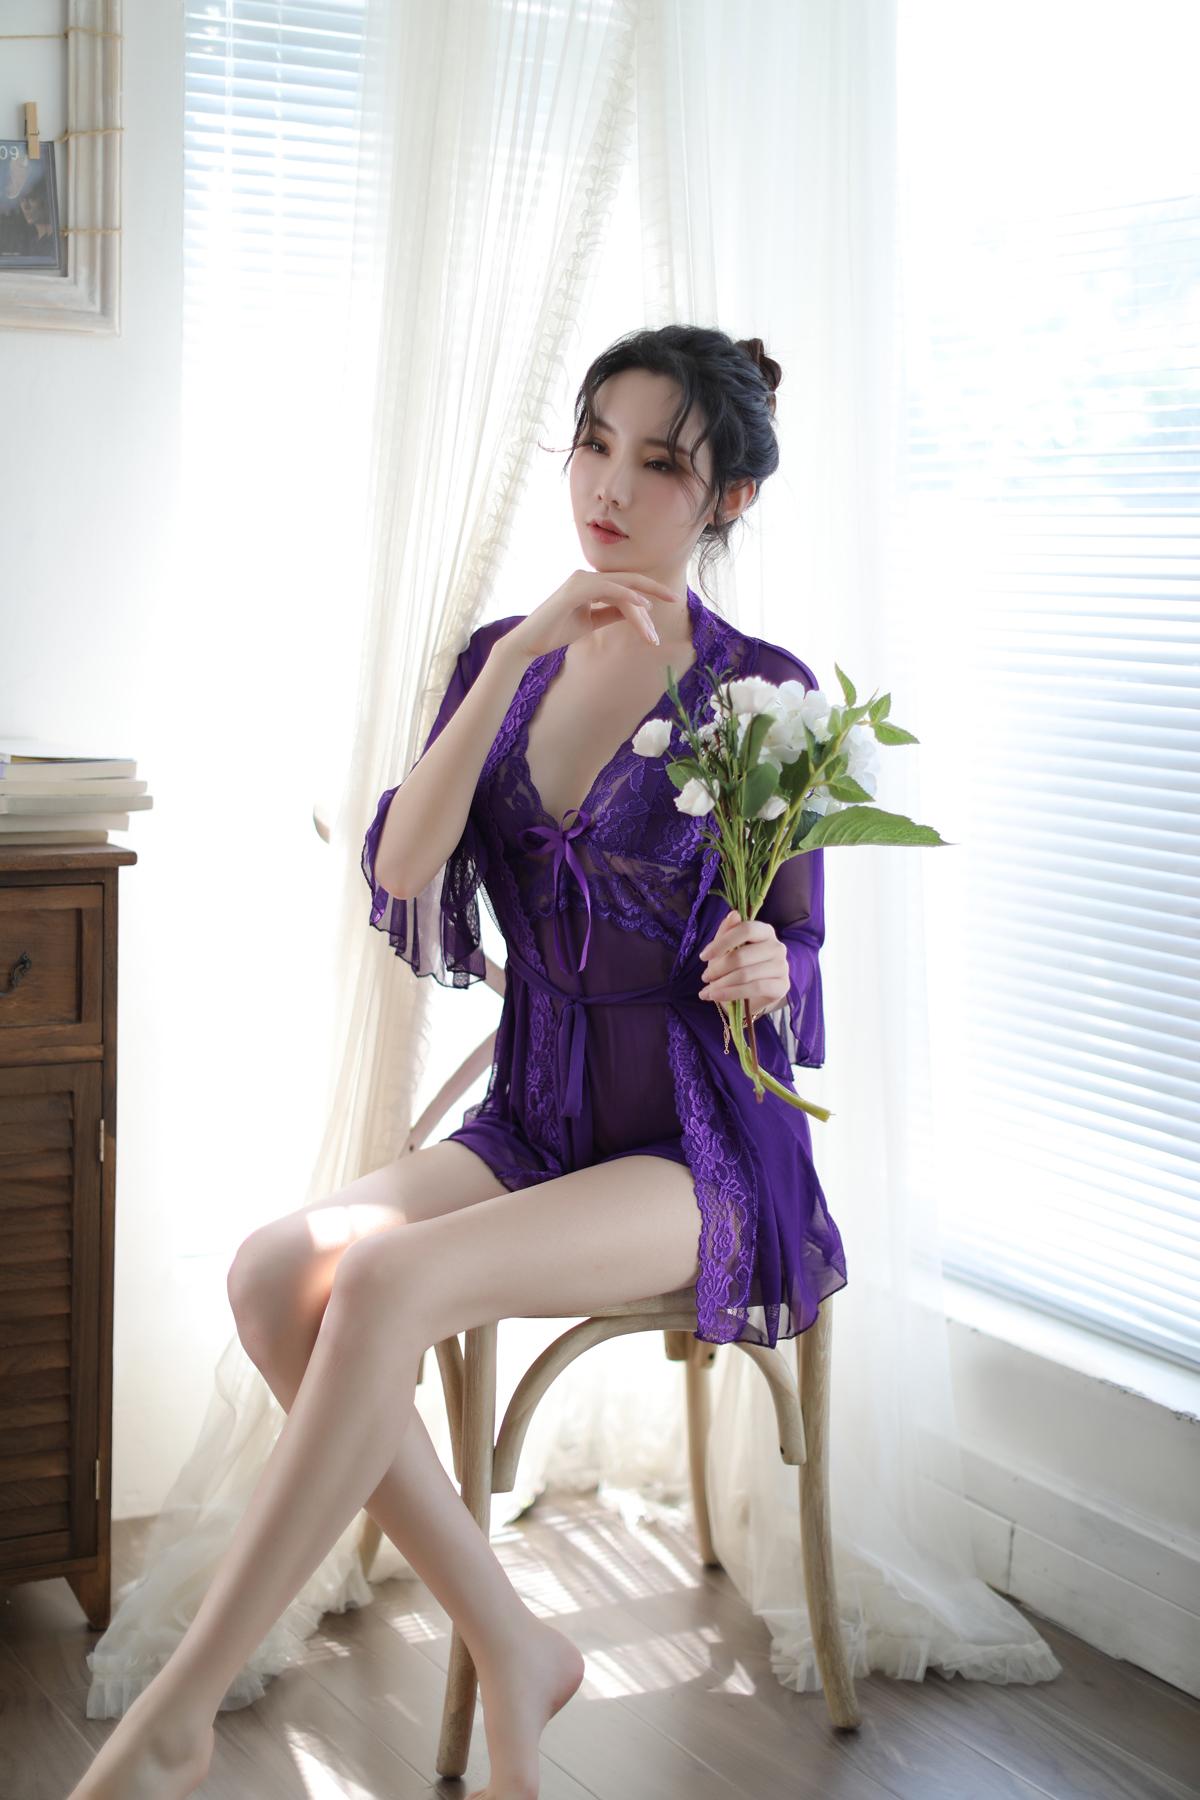 Yg X50 Pretty Design Mature Women Hot Sexy See Through